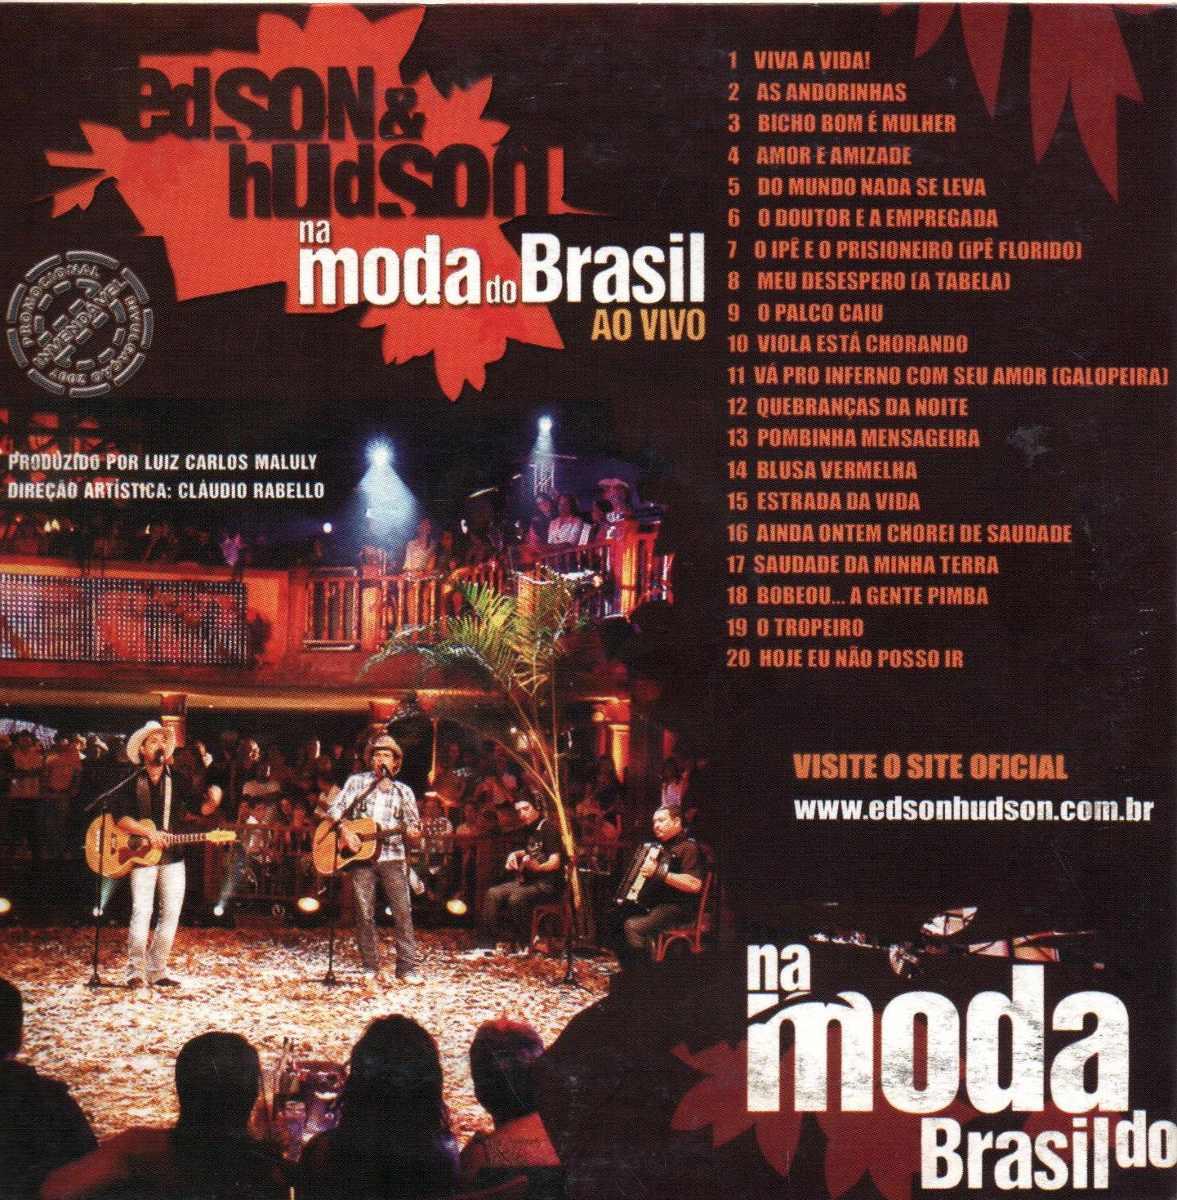 cd edson e hudson na moda do brasil